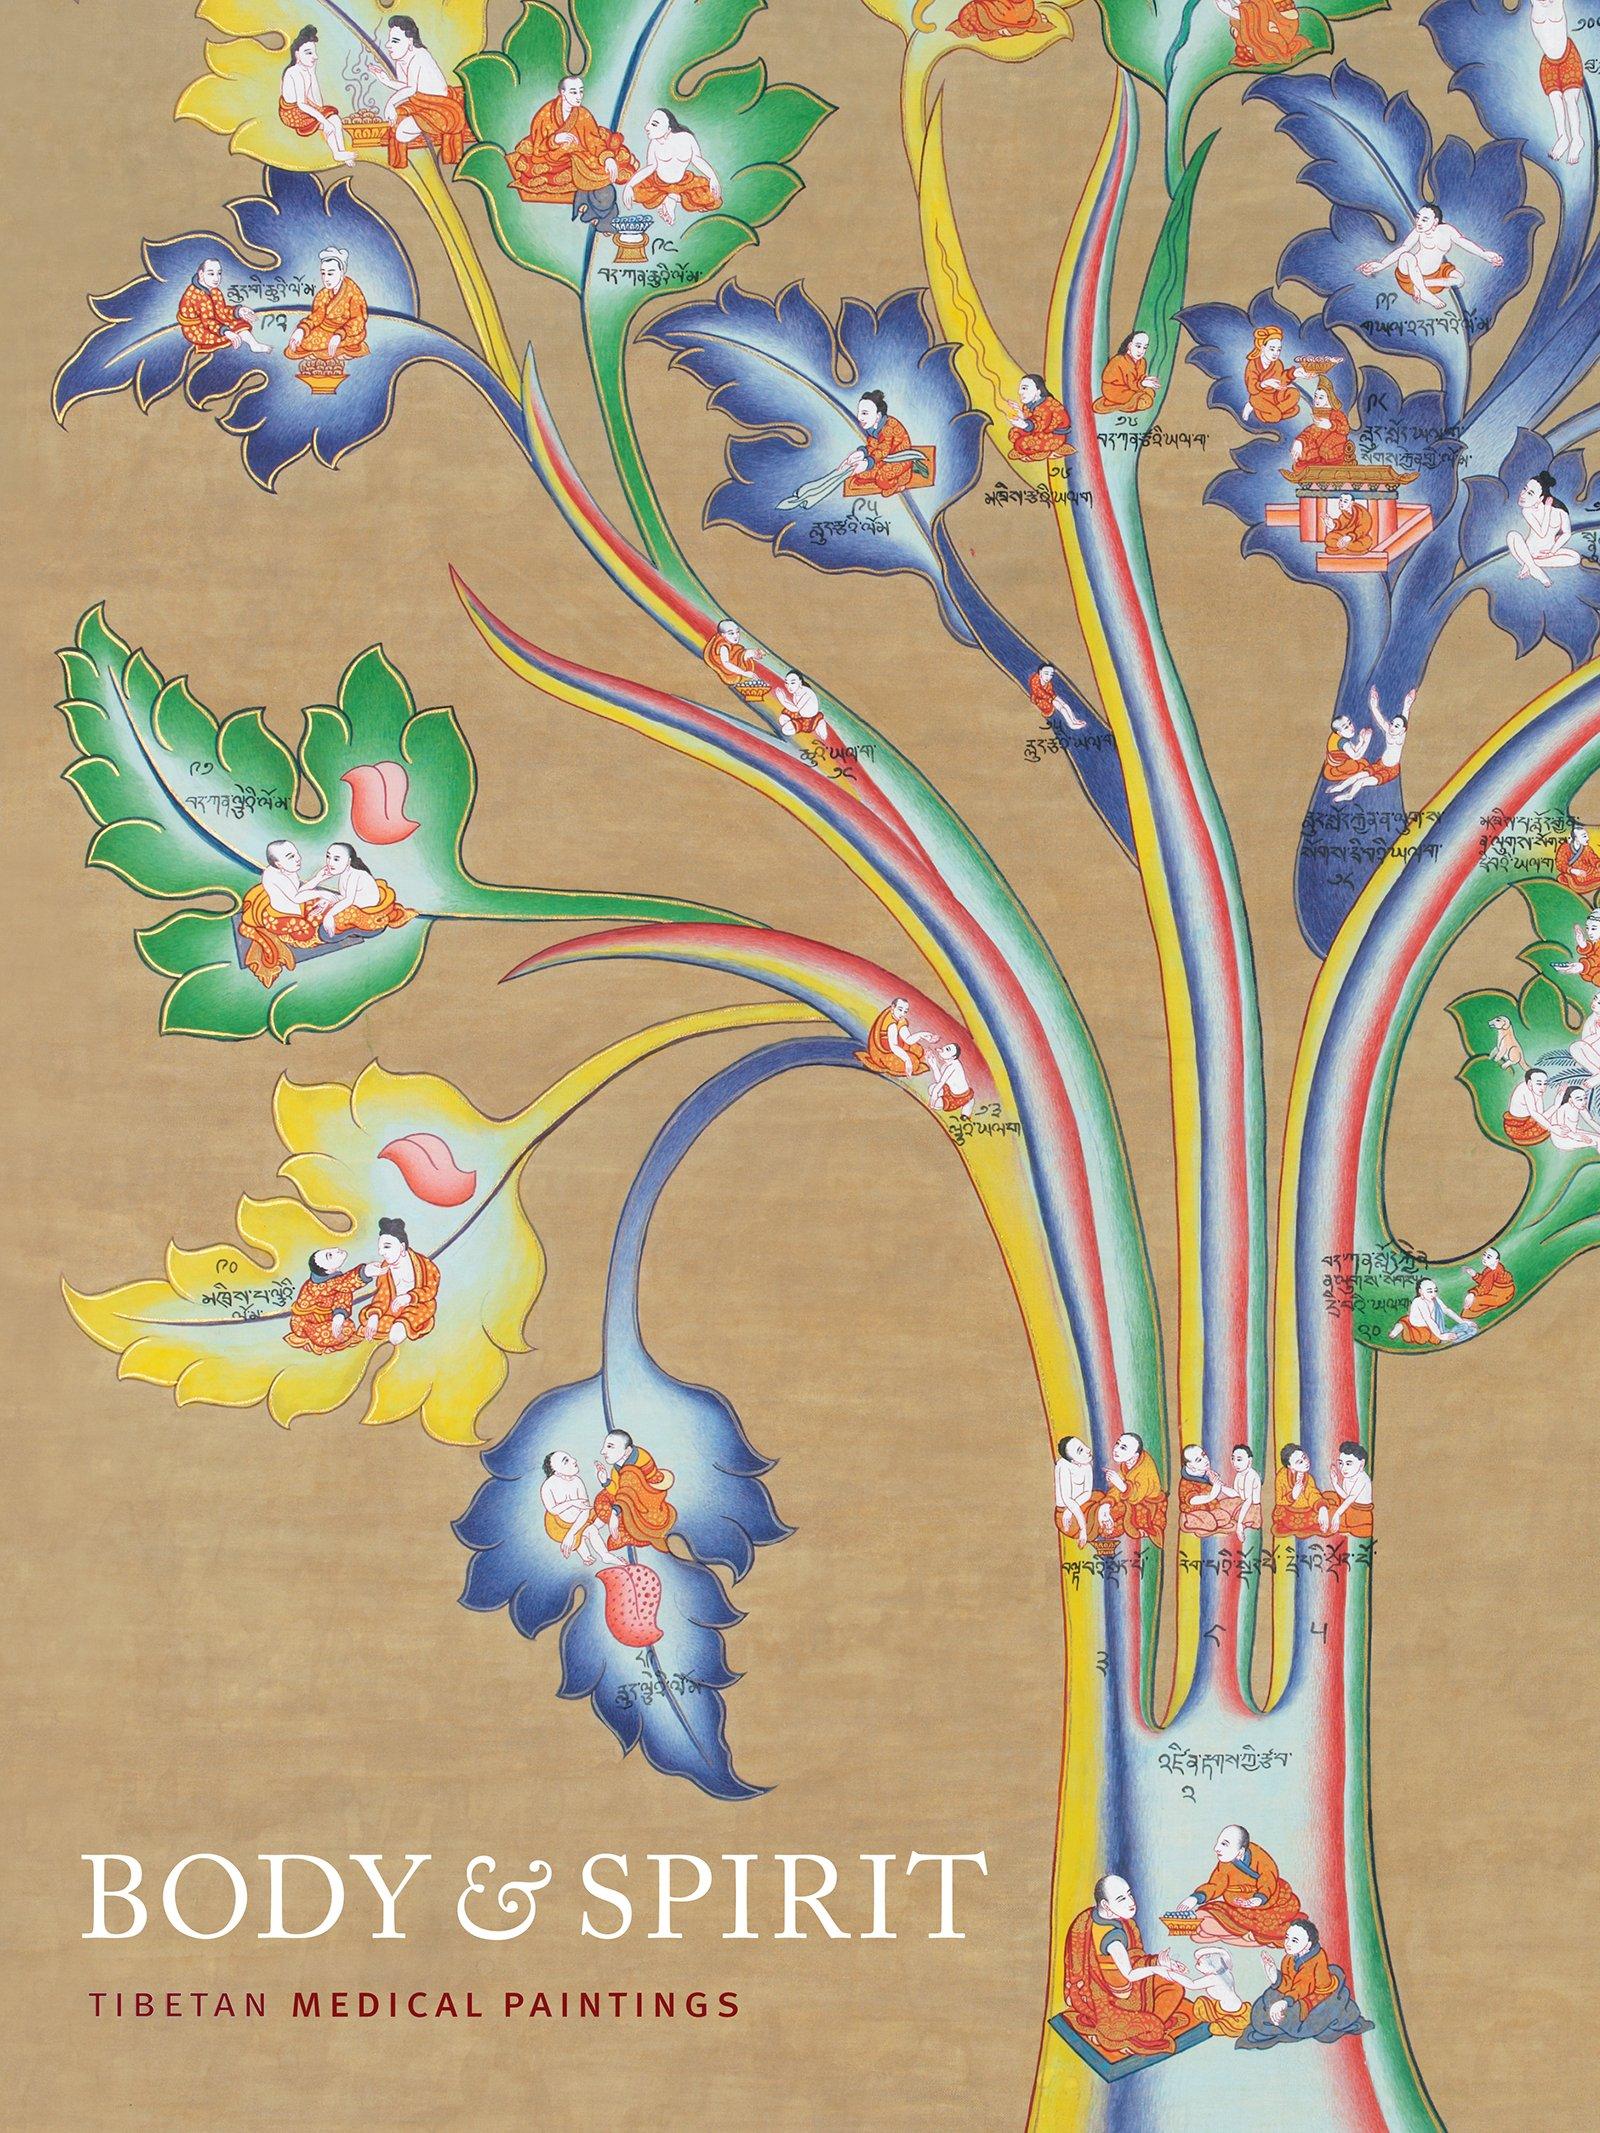 Amazon.com: Body and Spirit: Tibetan Medical Paintings ...